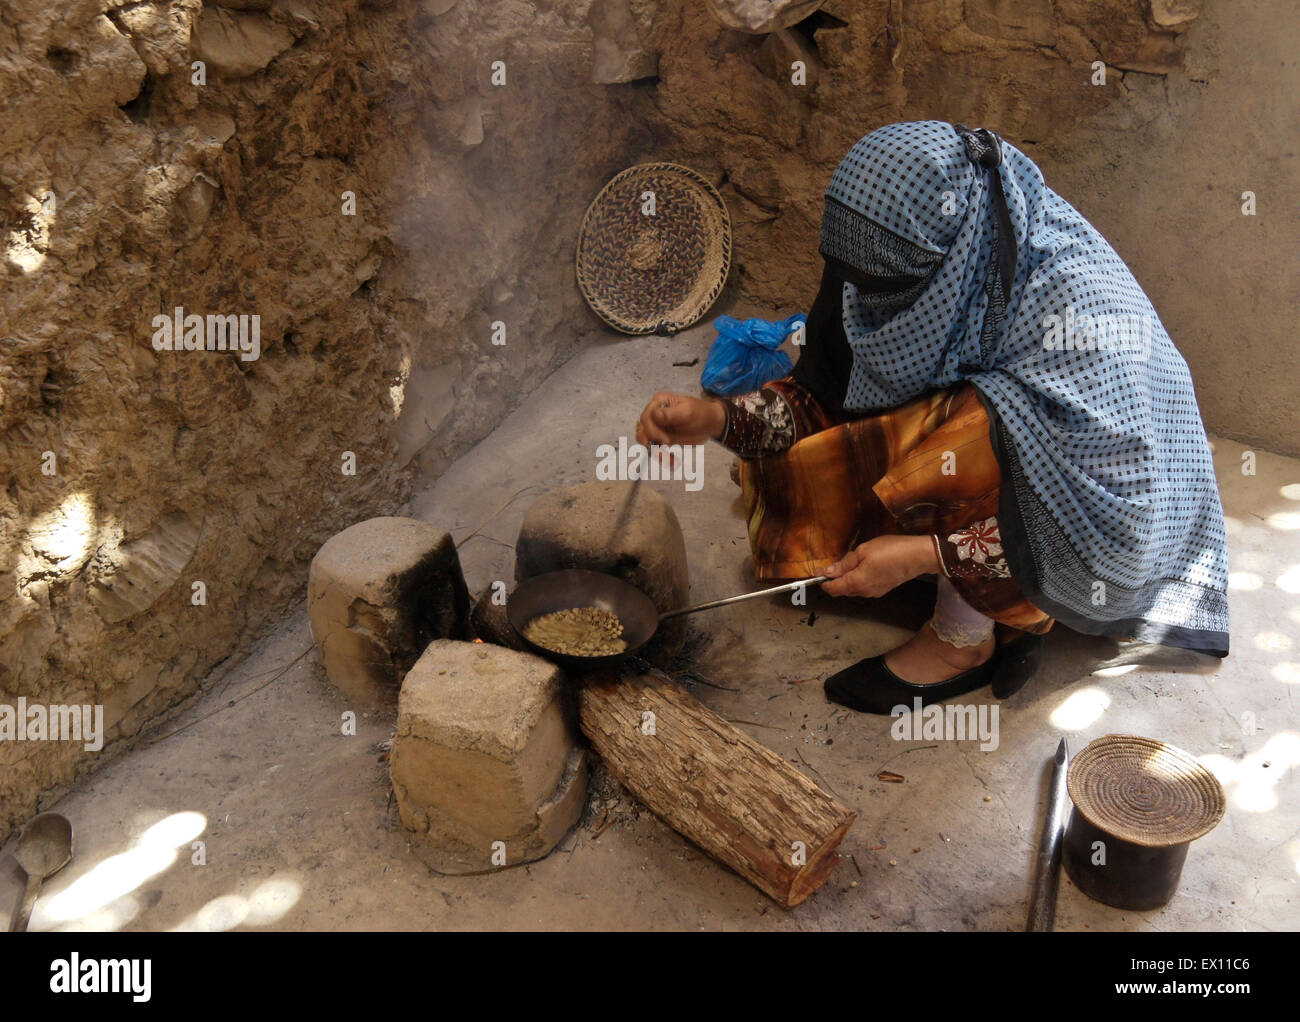 Woman roasting coffee beans, Bait al Safa Museum, Al-Hamra, Sultanate of Oman - Stock Image